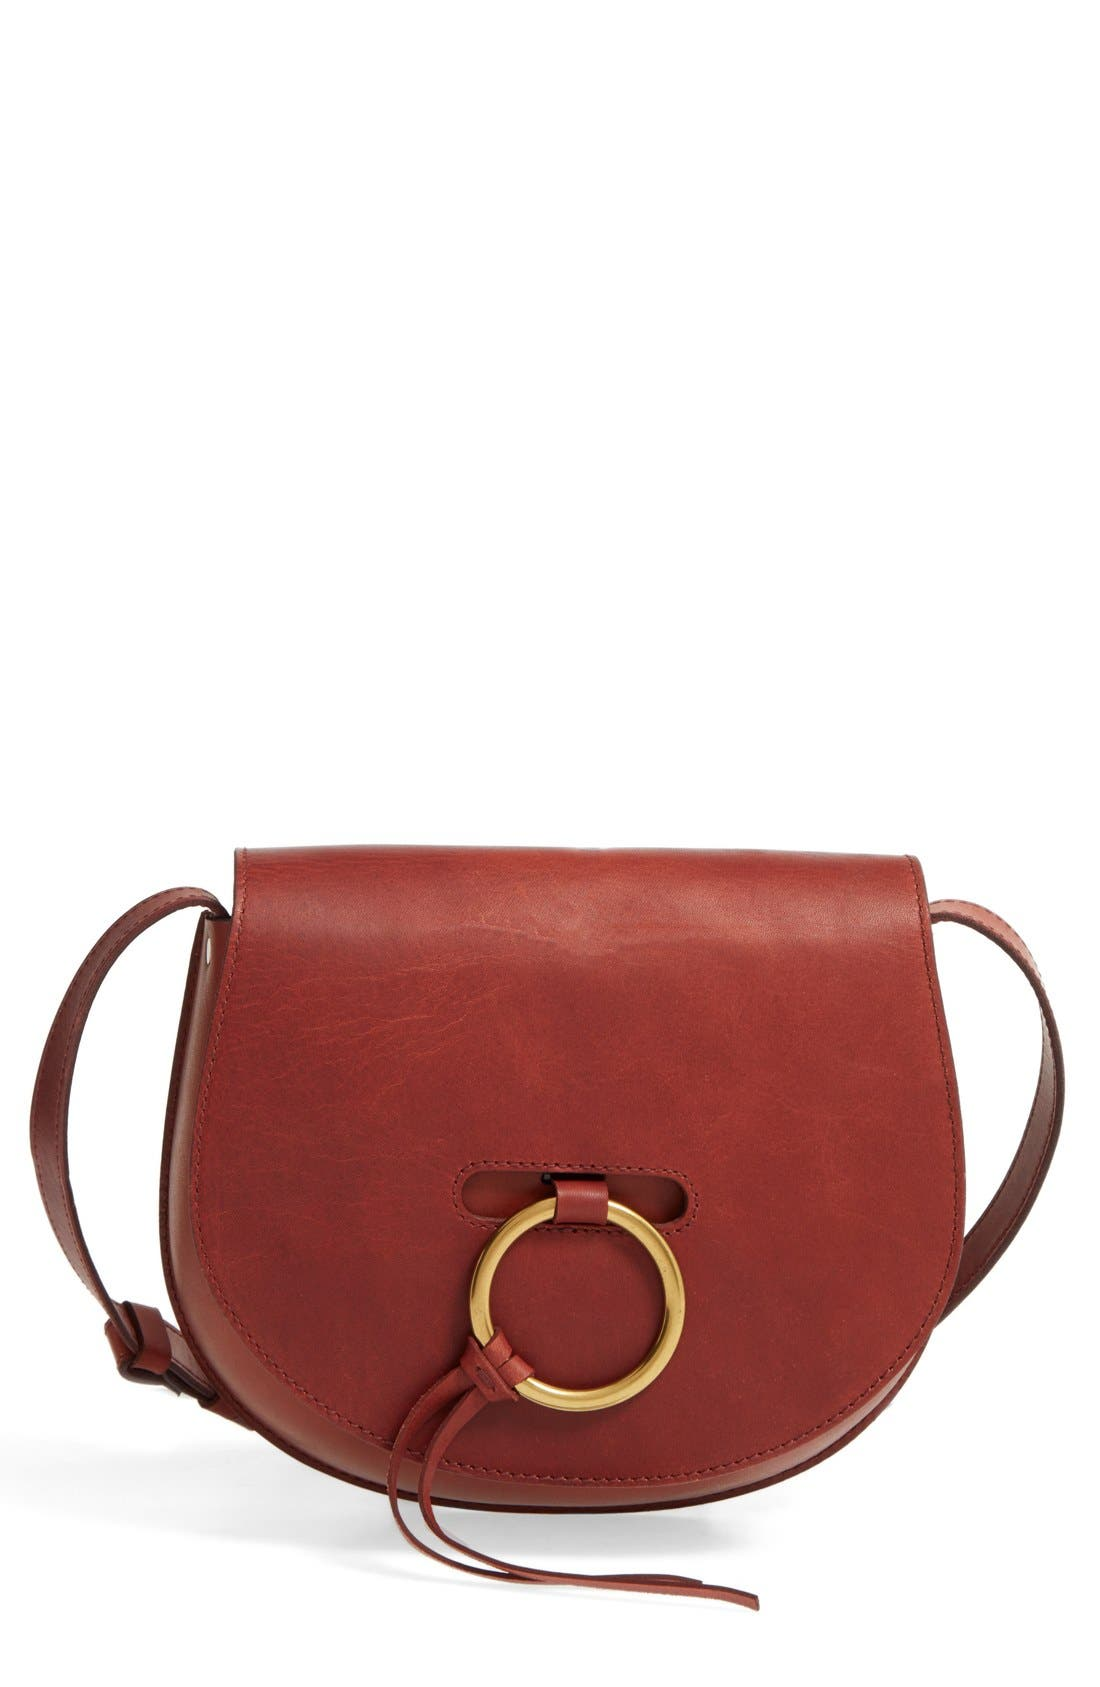 Alternate Image 1 Selected - Madewell O-Ring Leather Saddle Bag